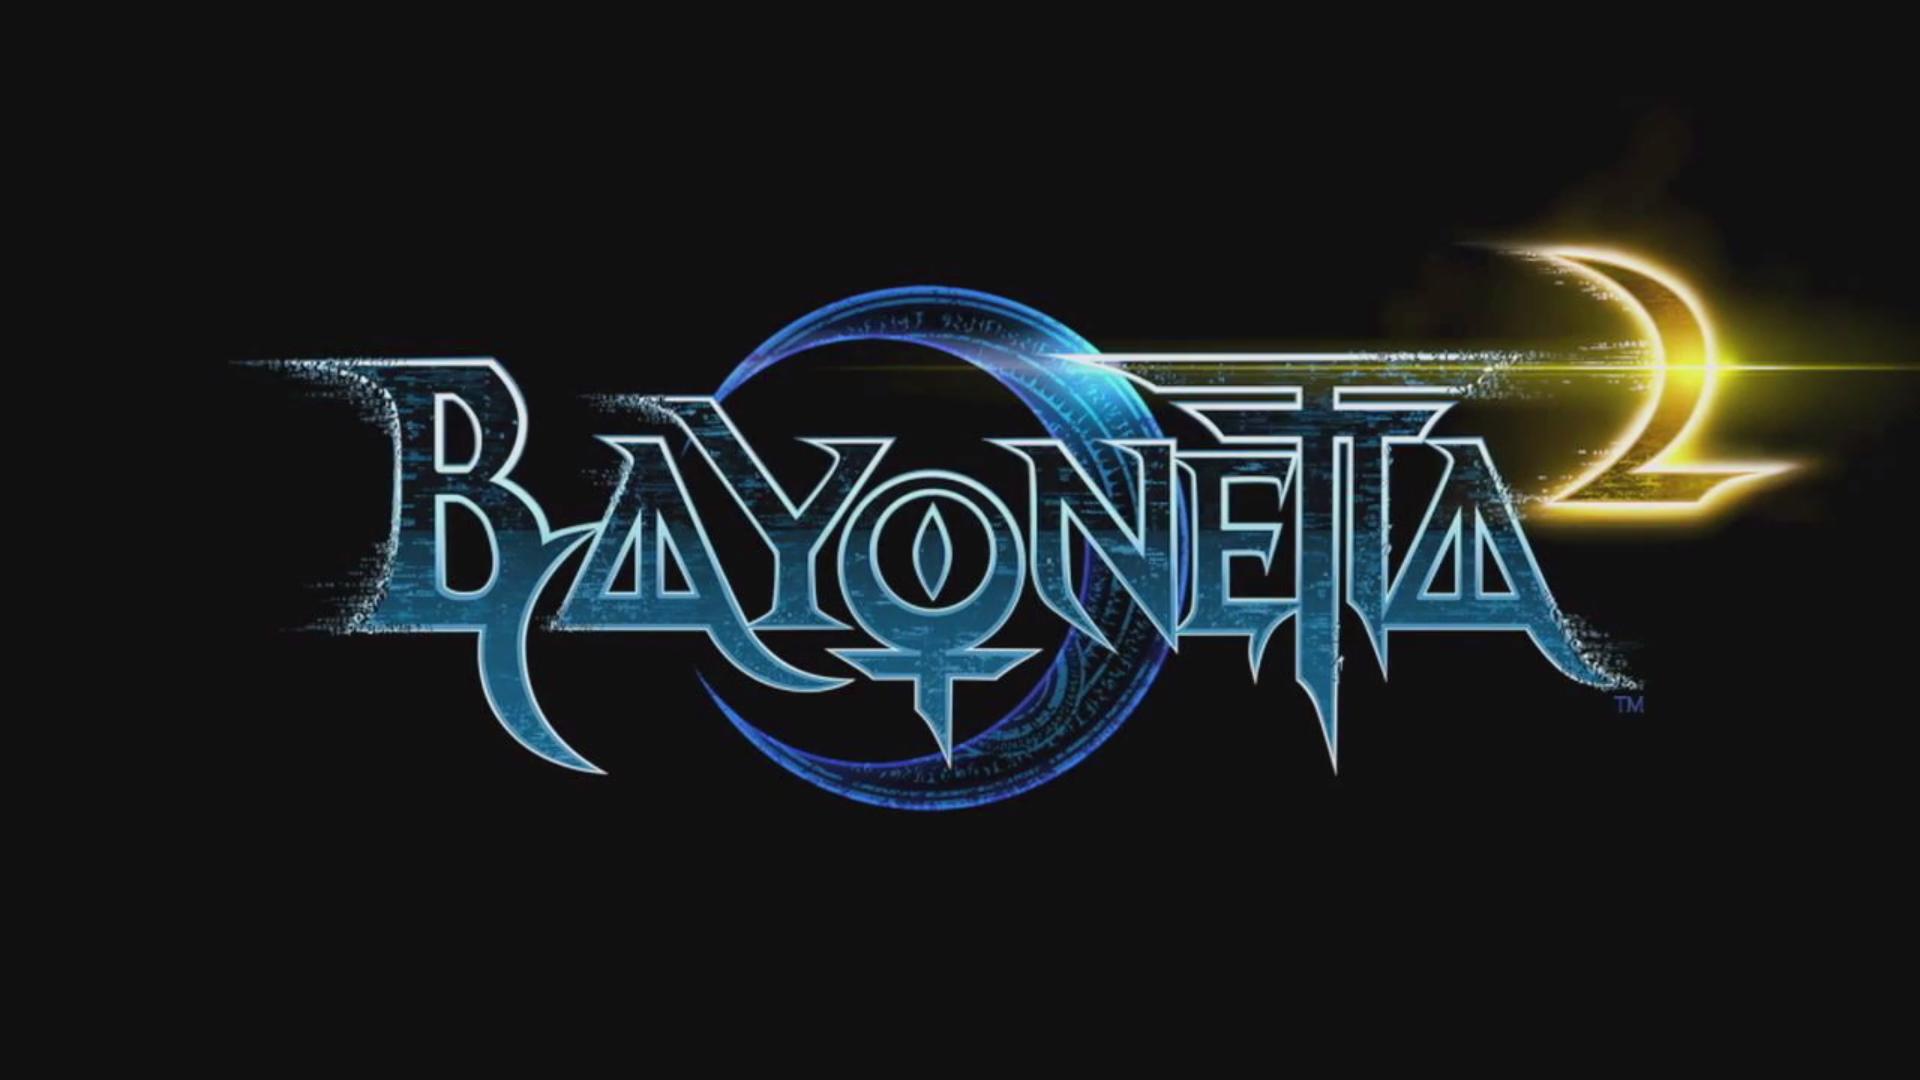 Nintendo of Europe launches Bayonneta 2 Website